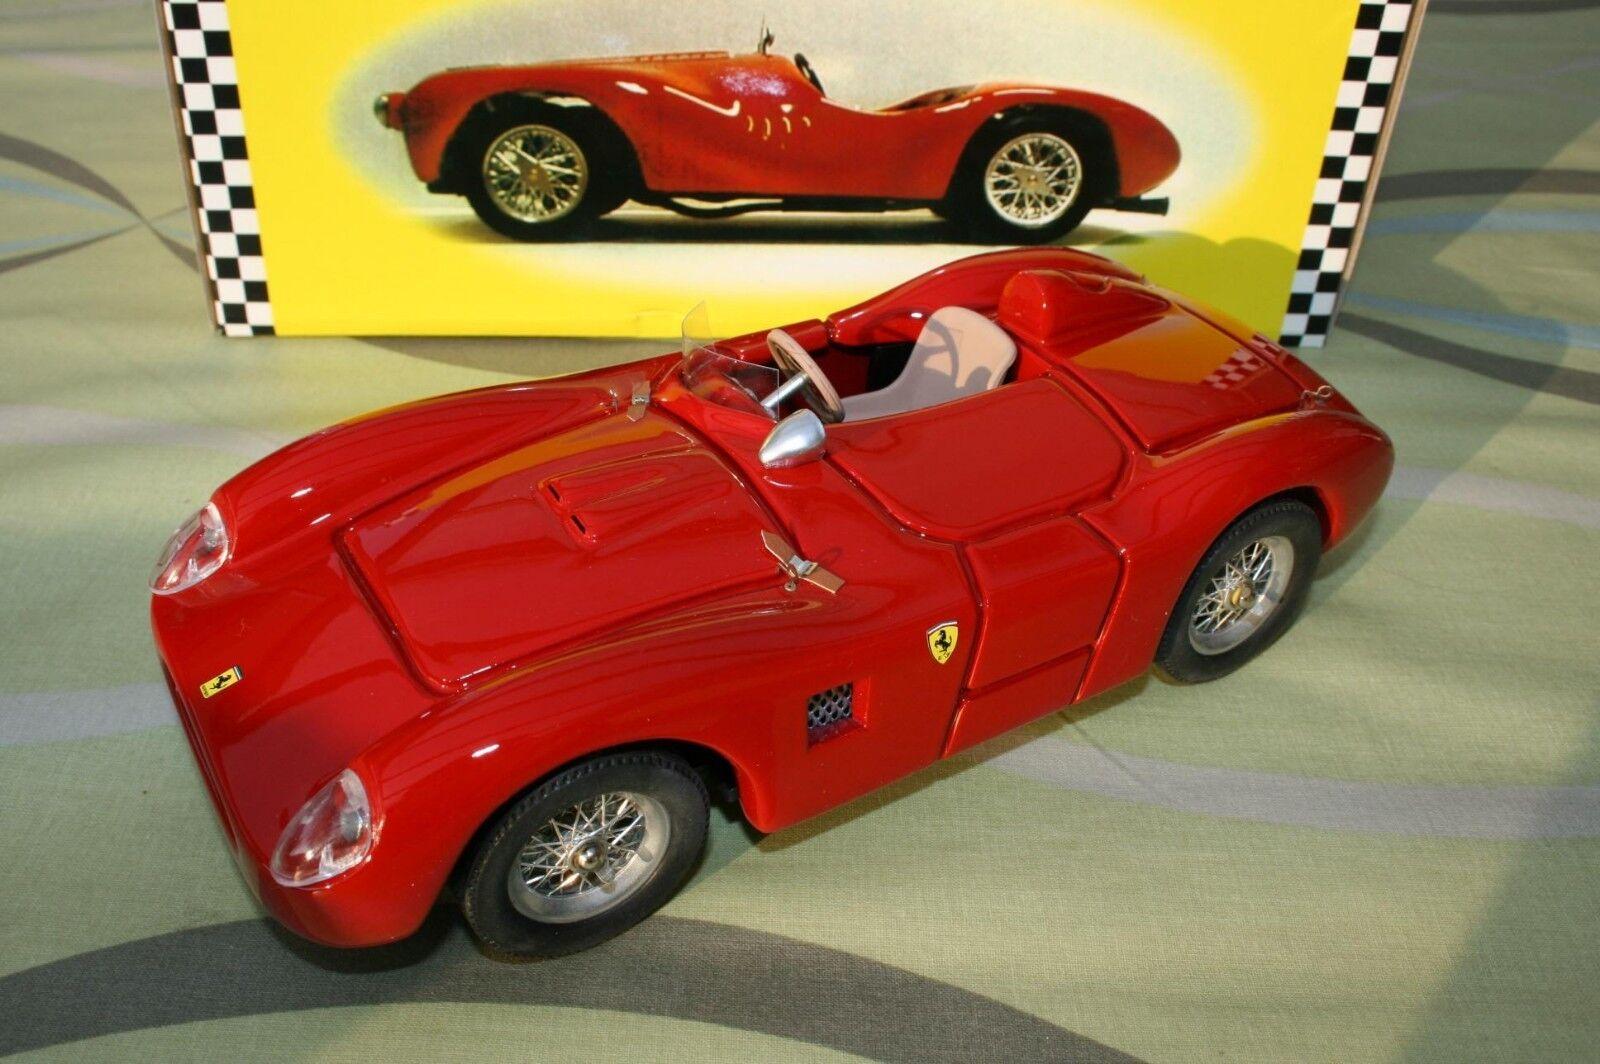 Ferrari rot Model 1 18 500 TR New in original box 300 pieces